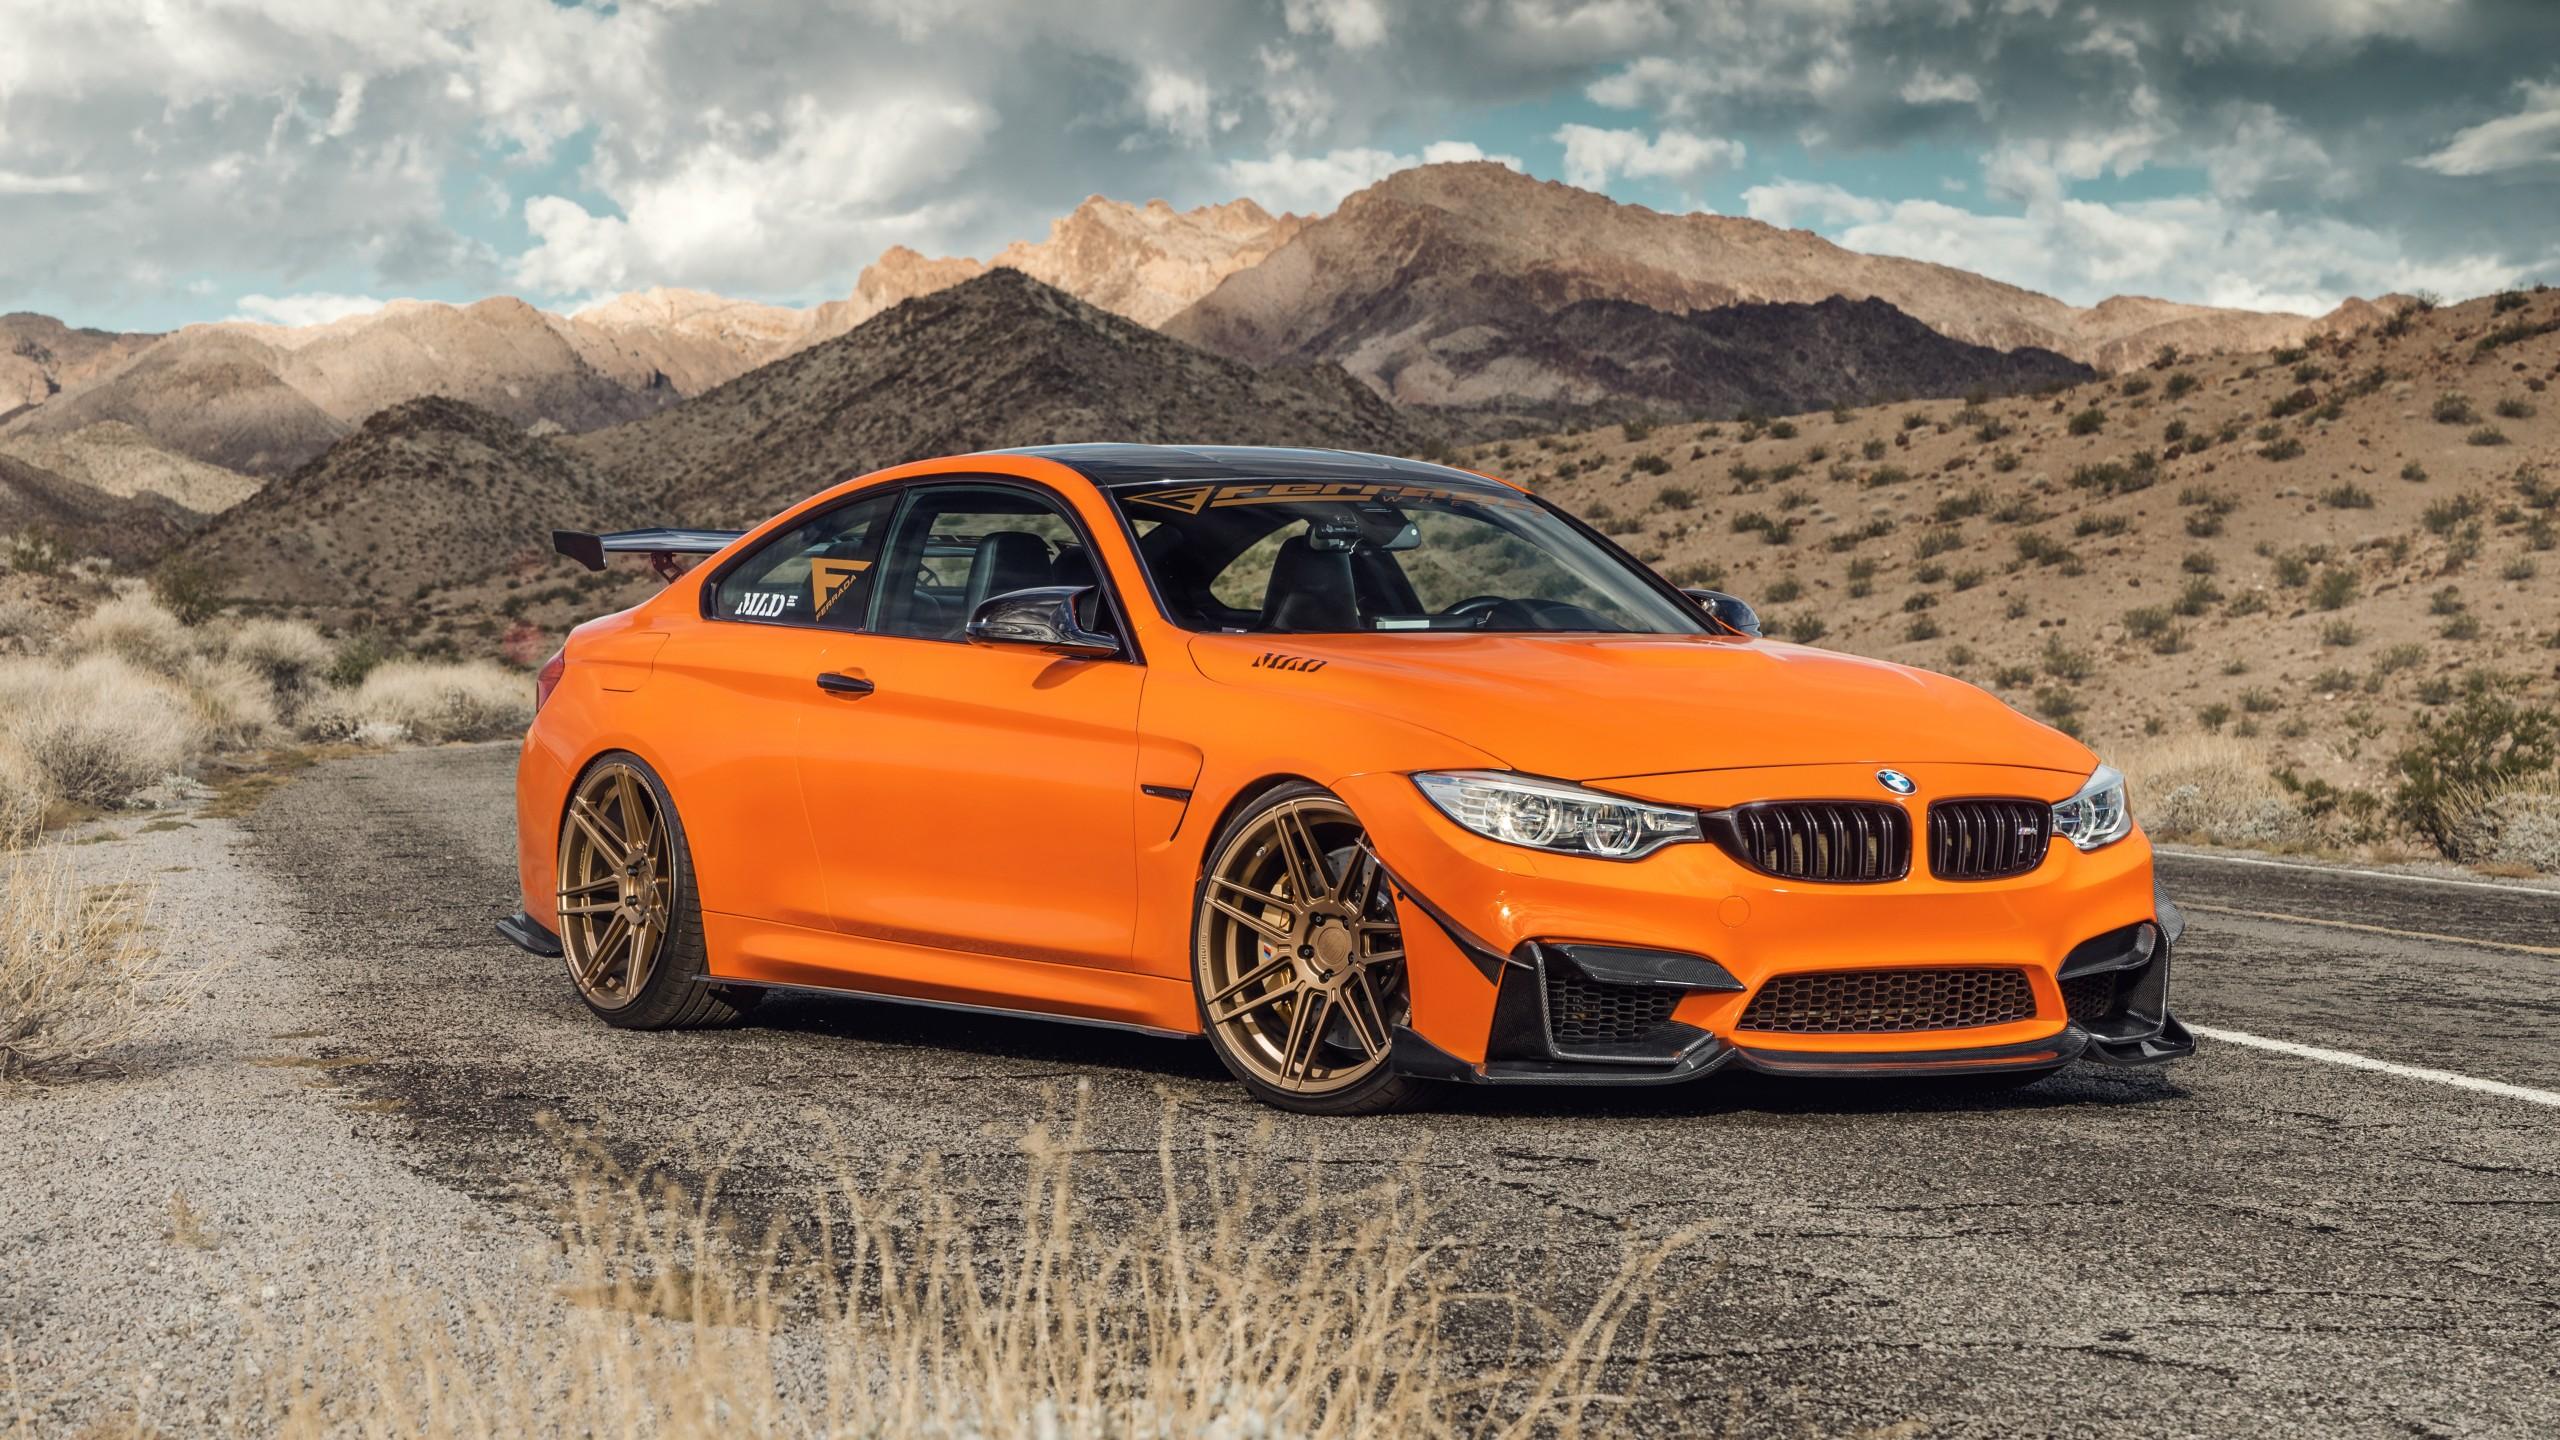 Bmw M4 Wallpaper Iphone X Ferrada Sema Orange Bmw M4 5k Wallpaper Hd Car